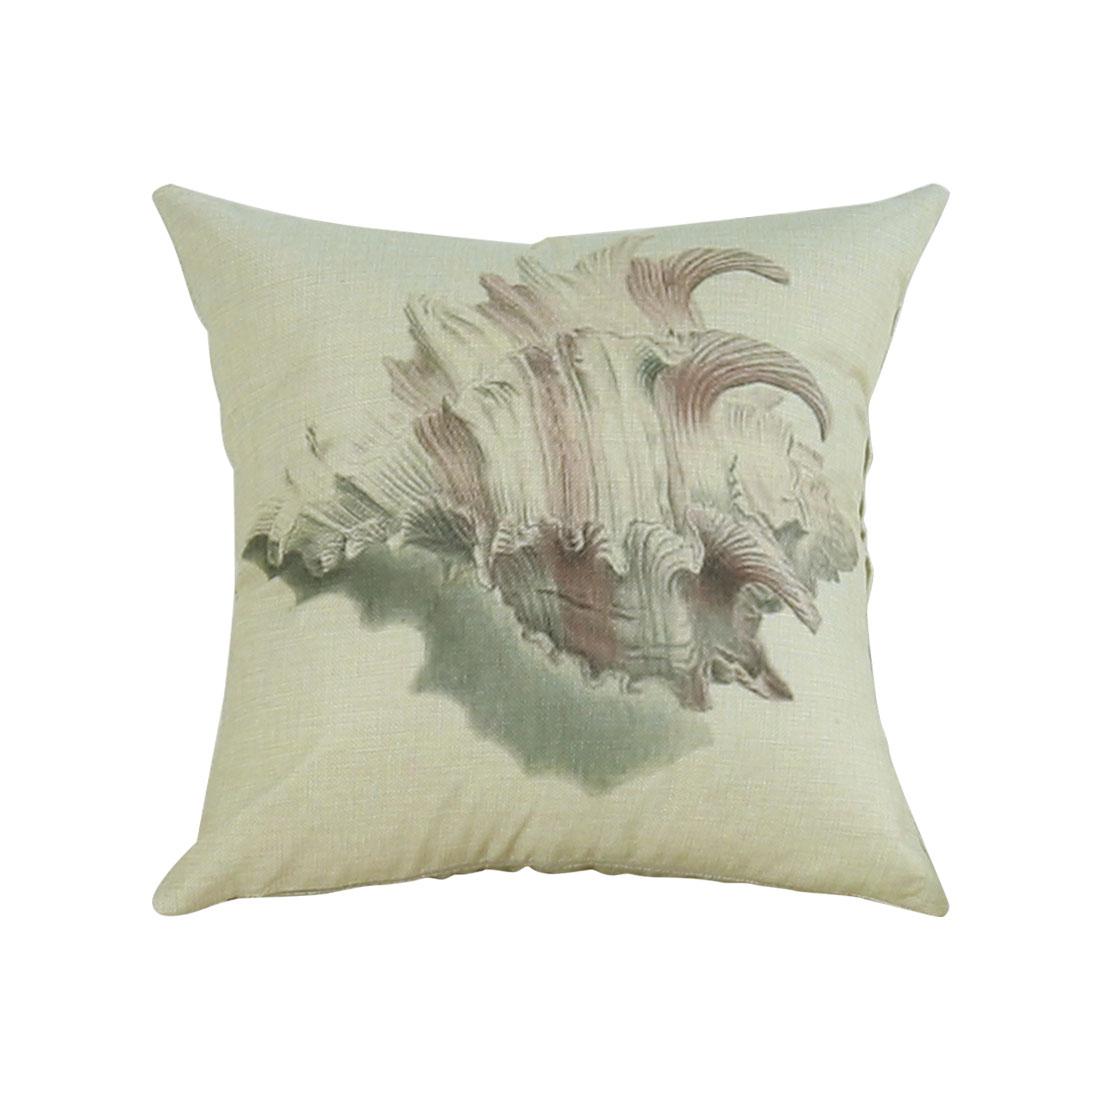 Piccocasa Home Sofa Linen Conch Pattern Square Shaped Cushion Cover